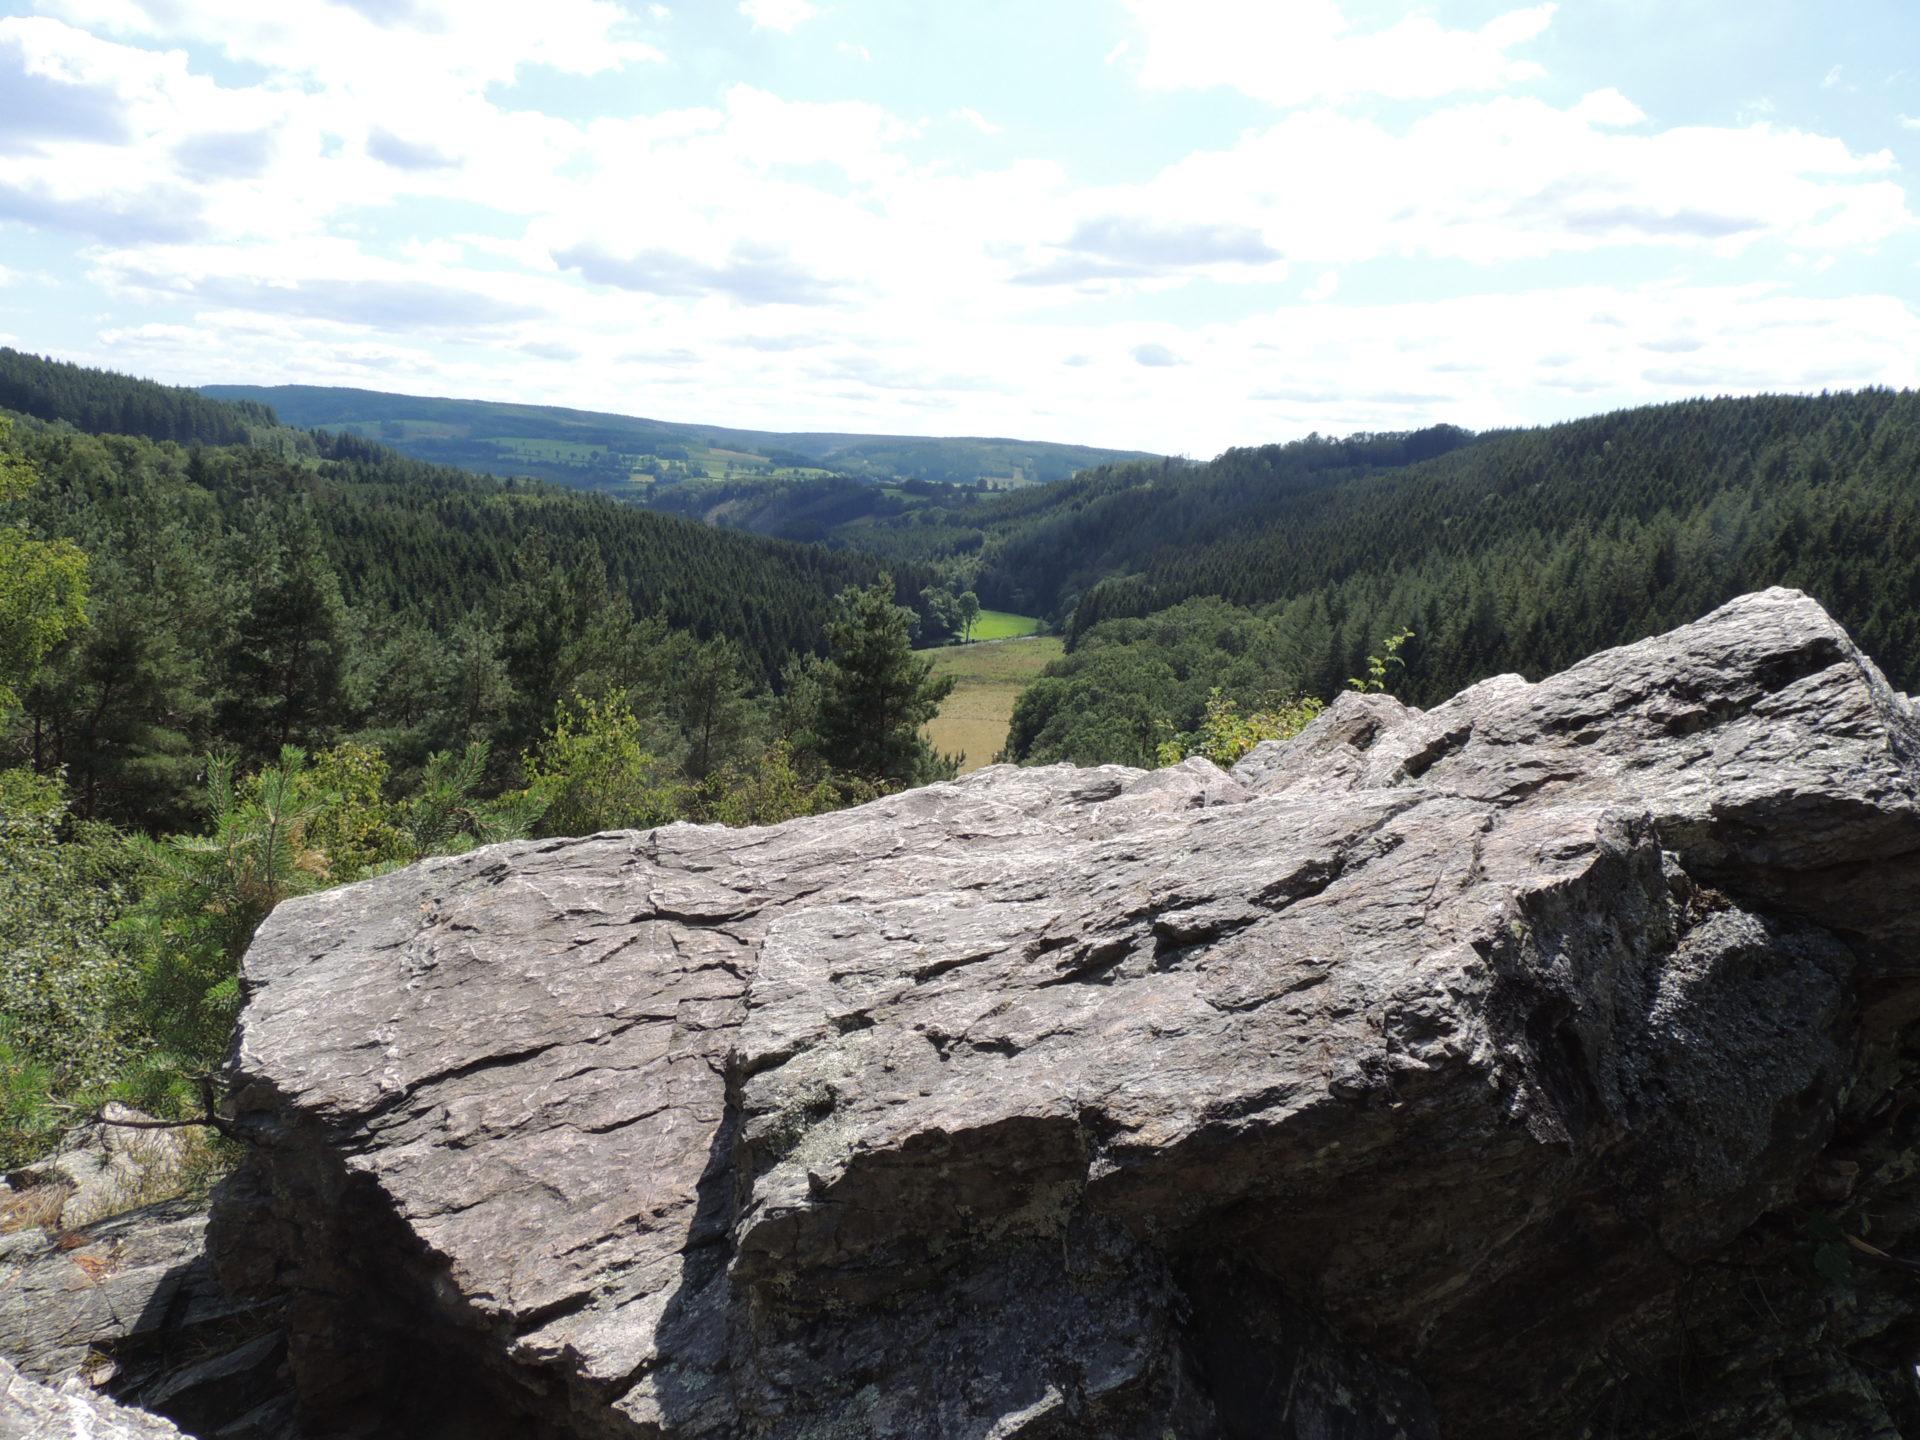 MDY15 Panorama des deux vallées